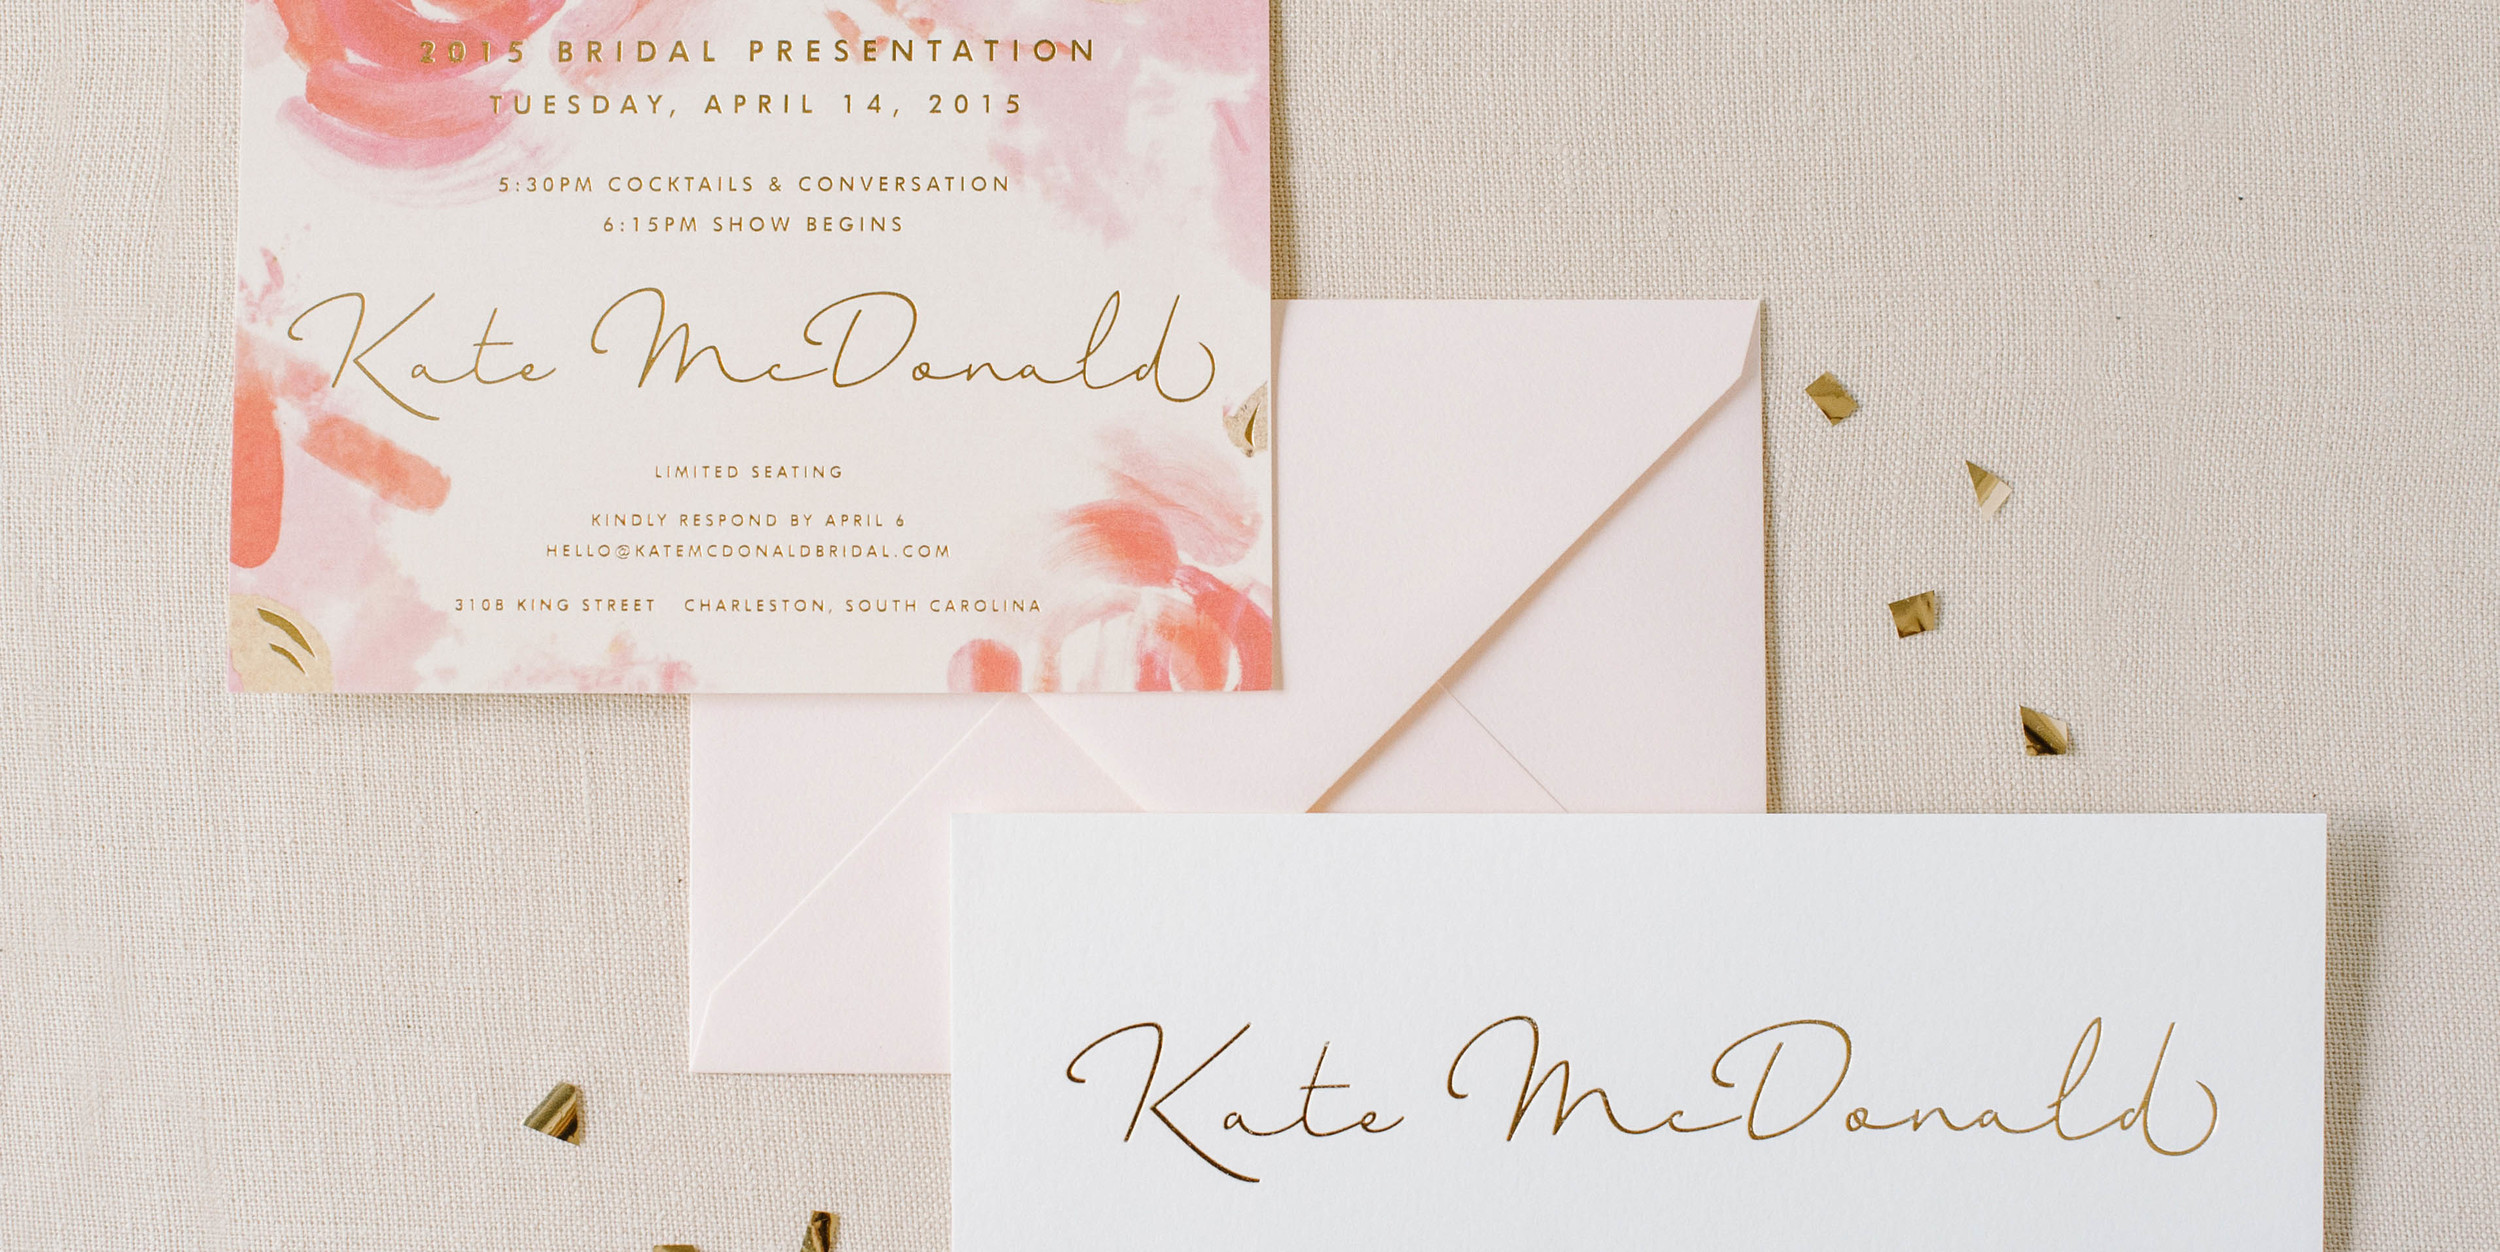 KateMcDonald-FoilInvite.jpg